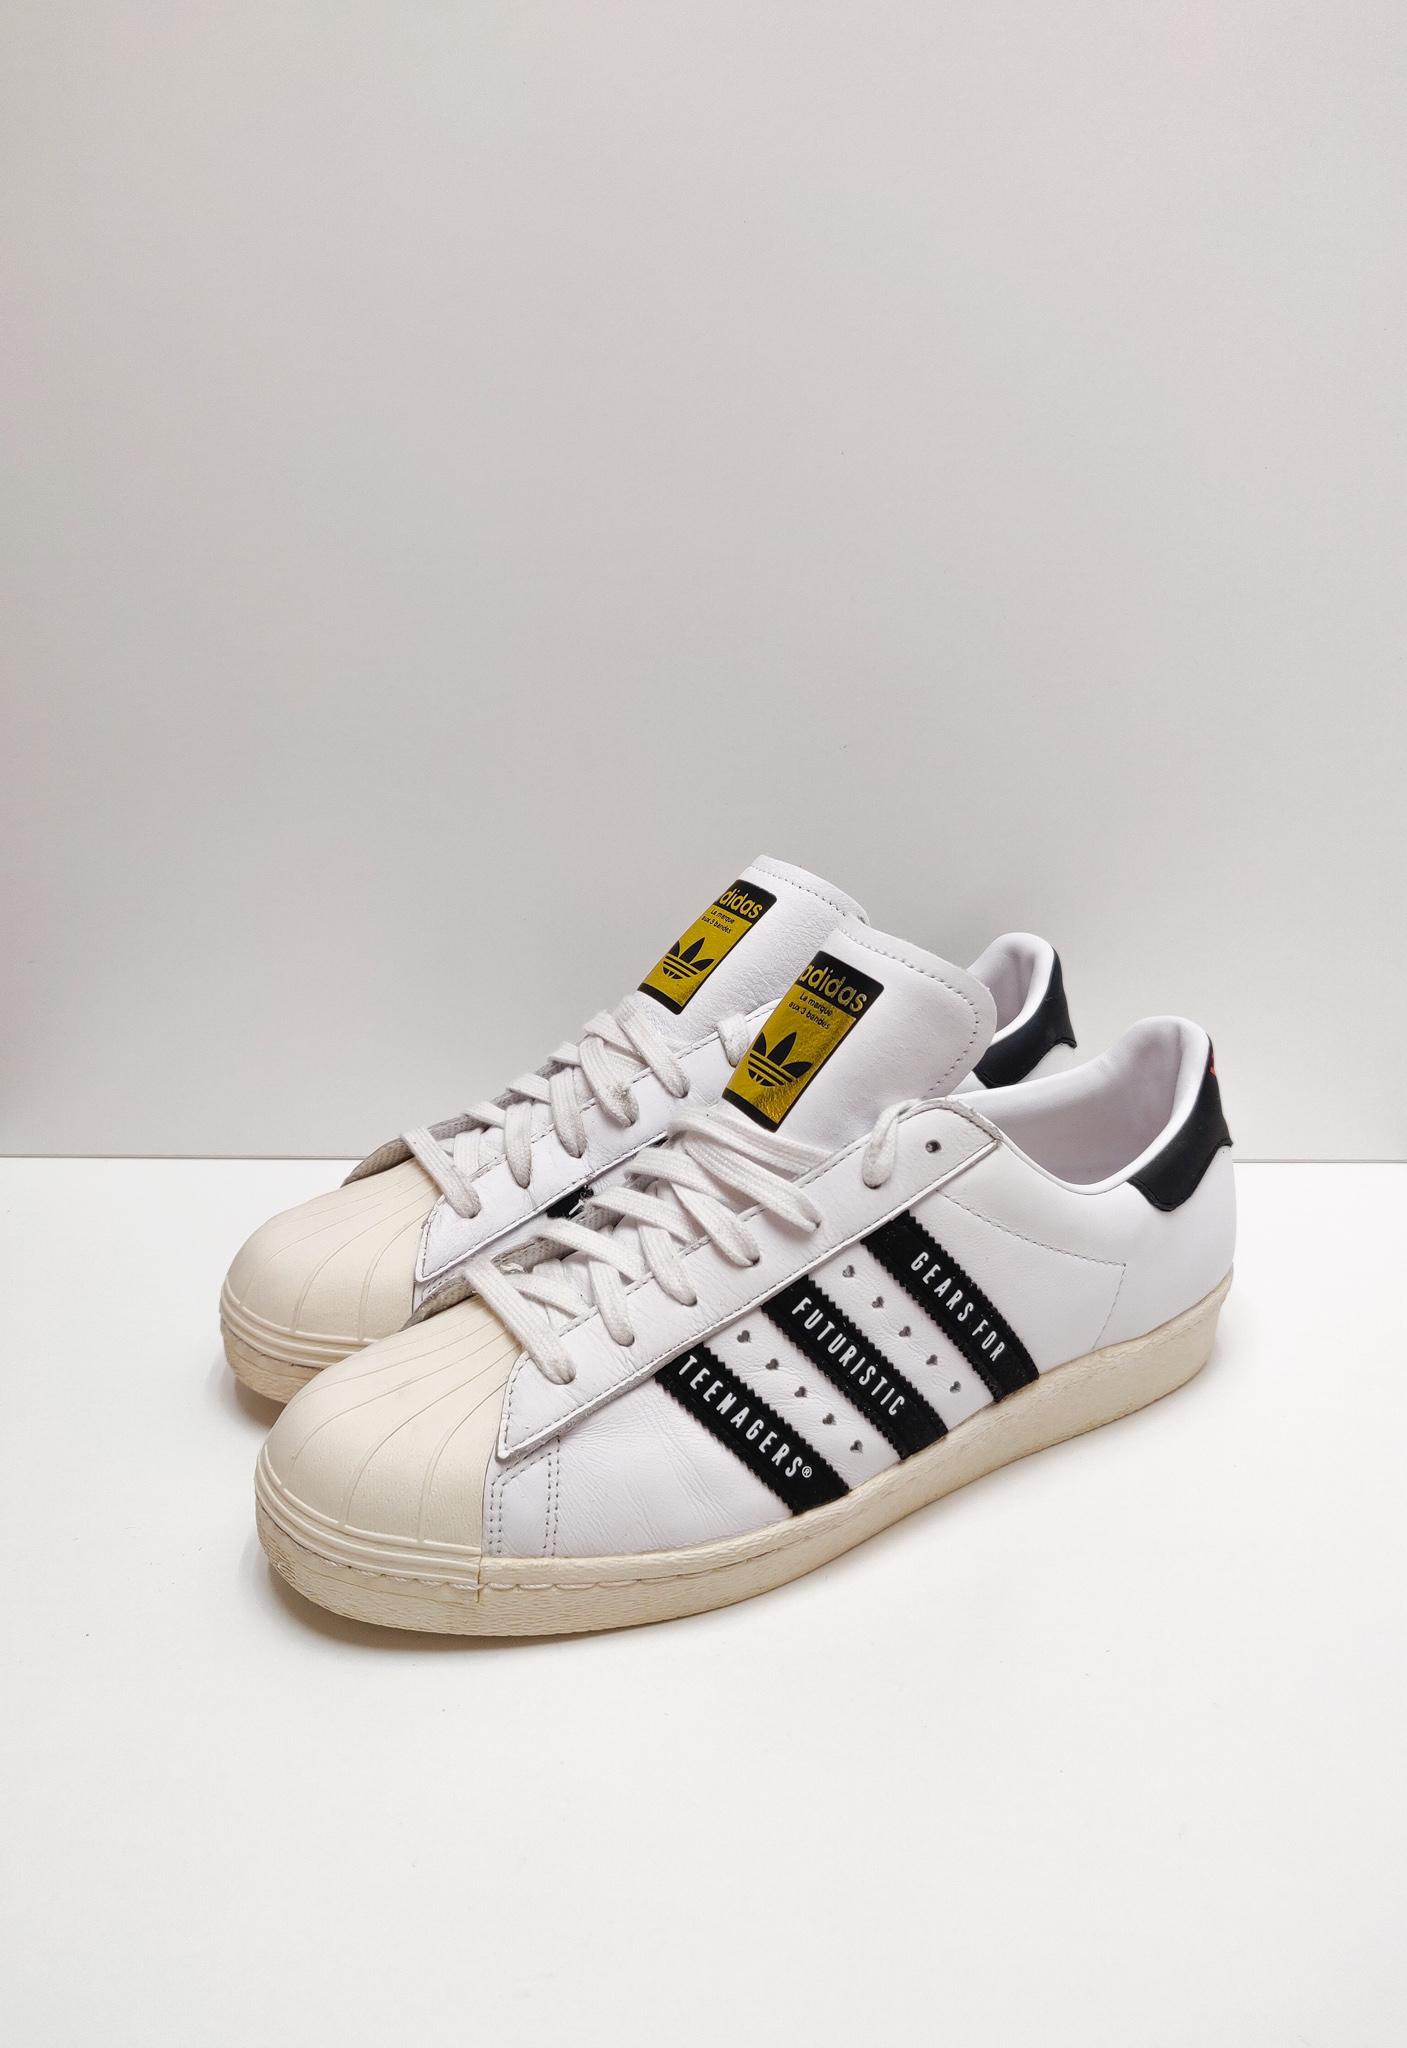 Adidas Superstar Human Made